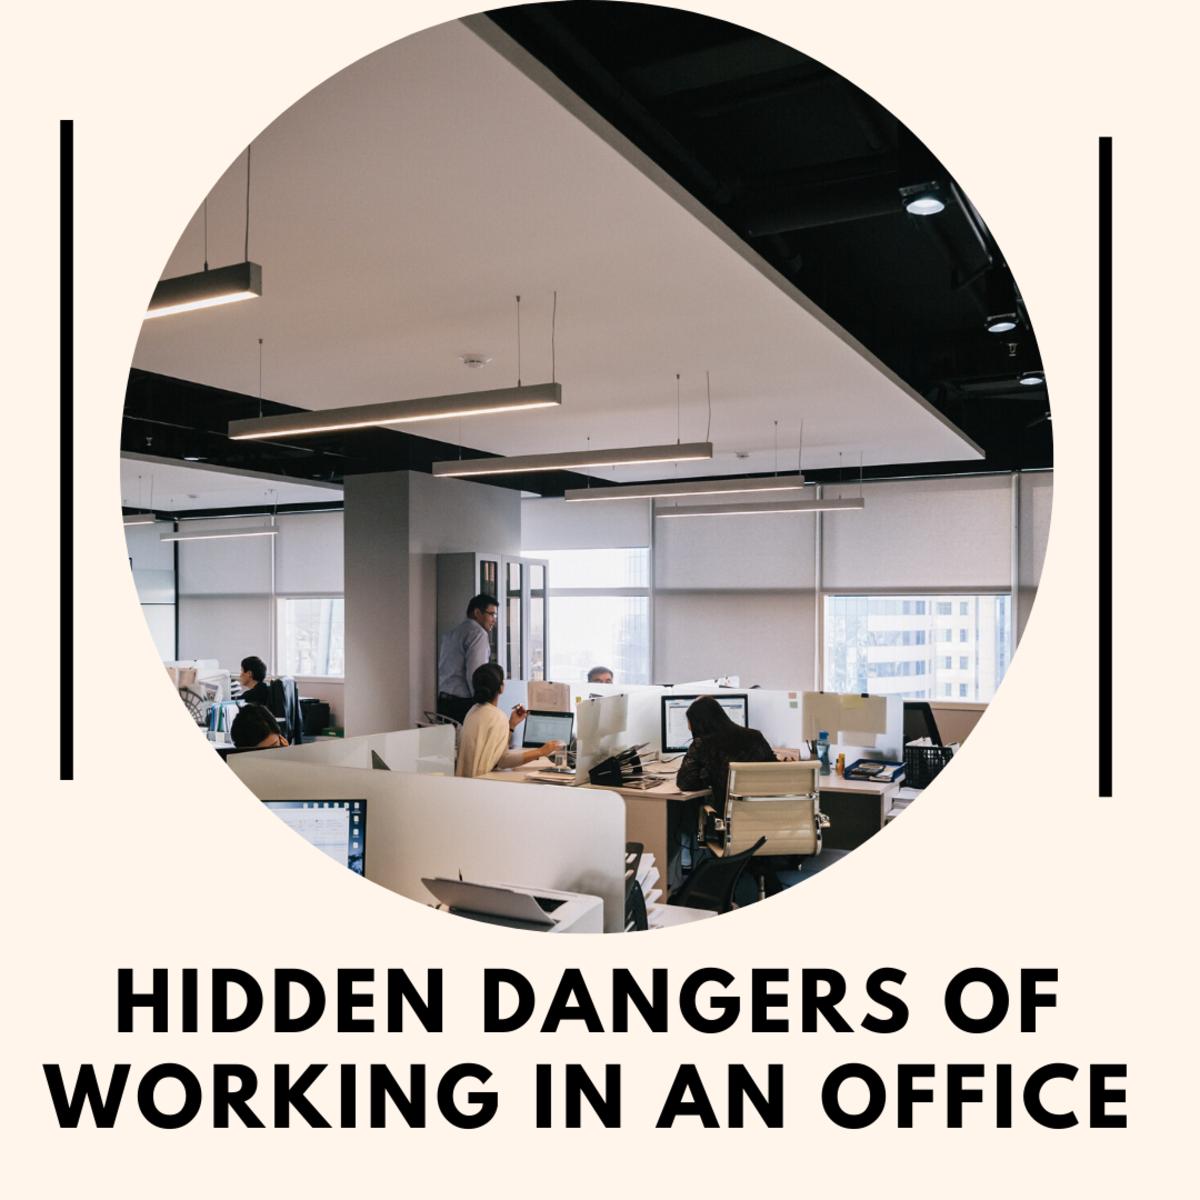 The Hidden Dangers of Working in an Office